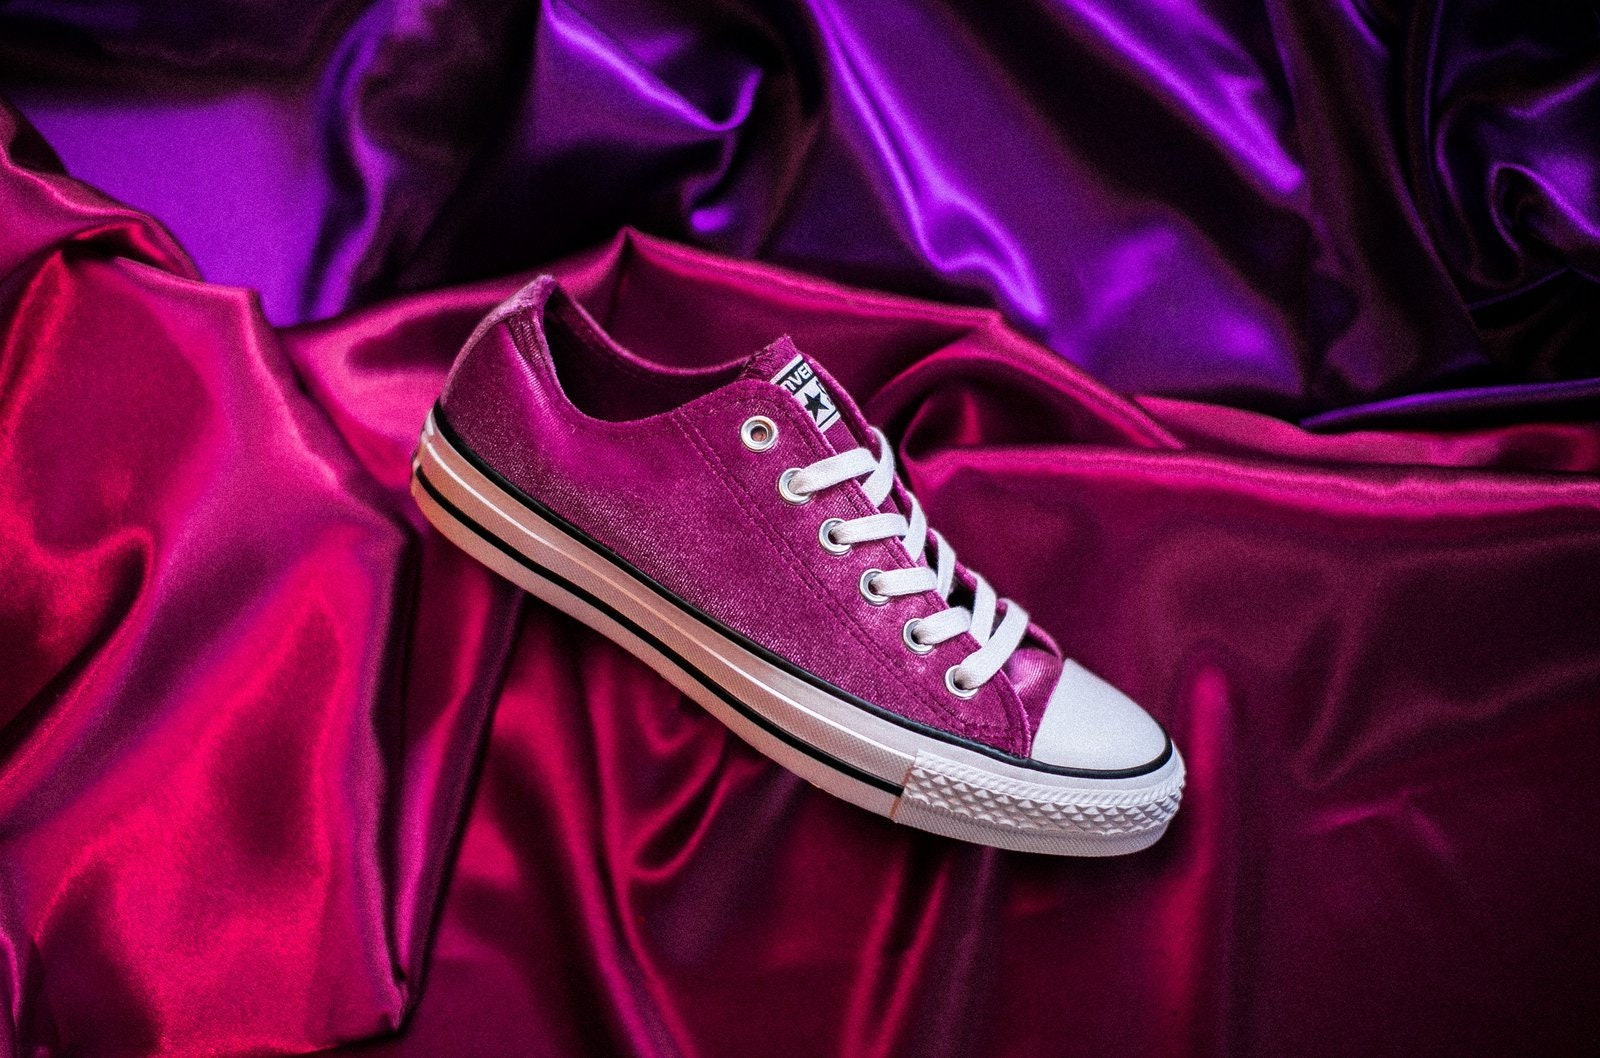 1a538bbe41c Hot Pink Converse Low Top Fuchsia Wedding Velvet w/ Swarovski ...